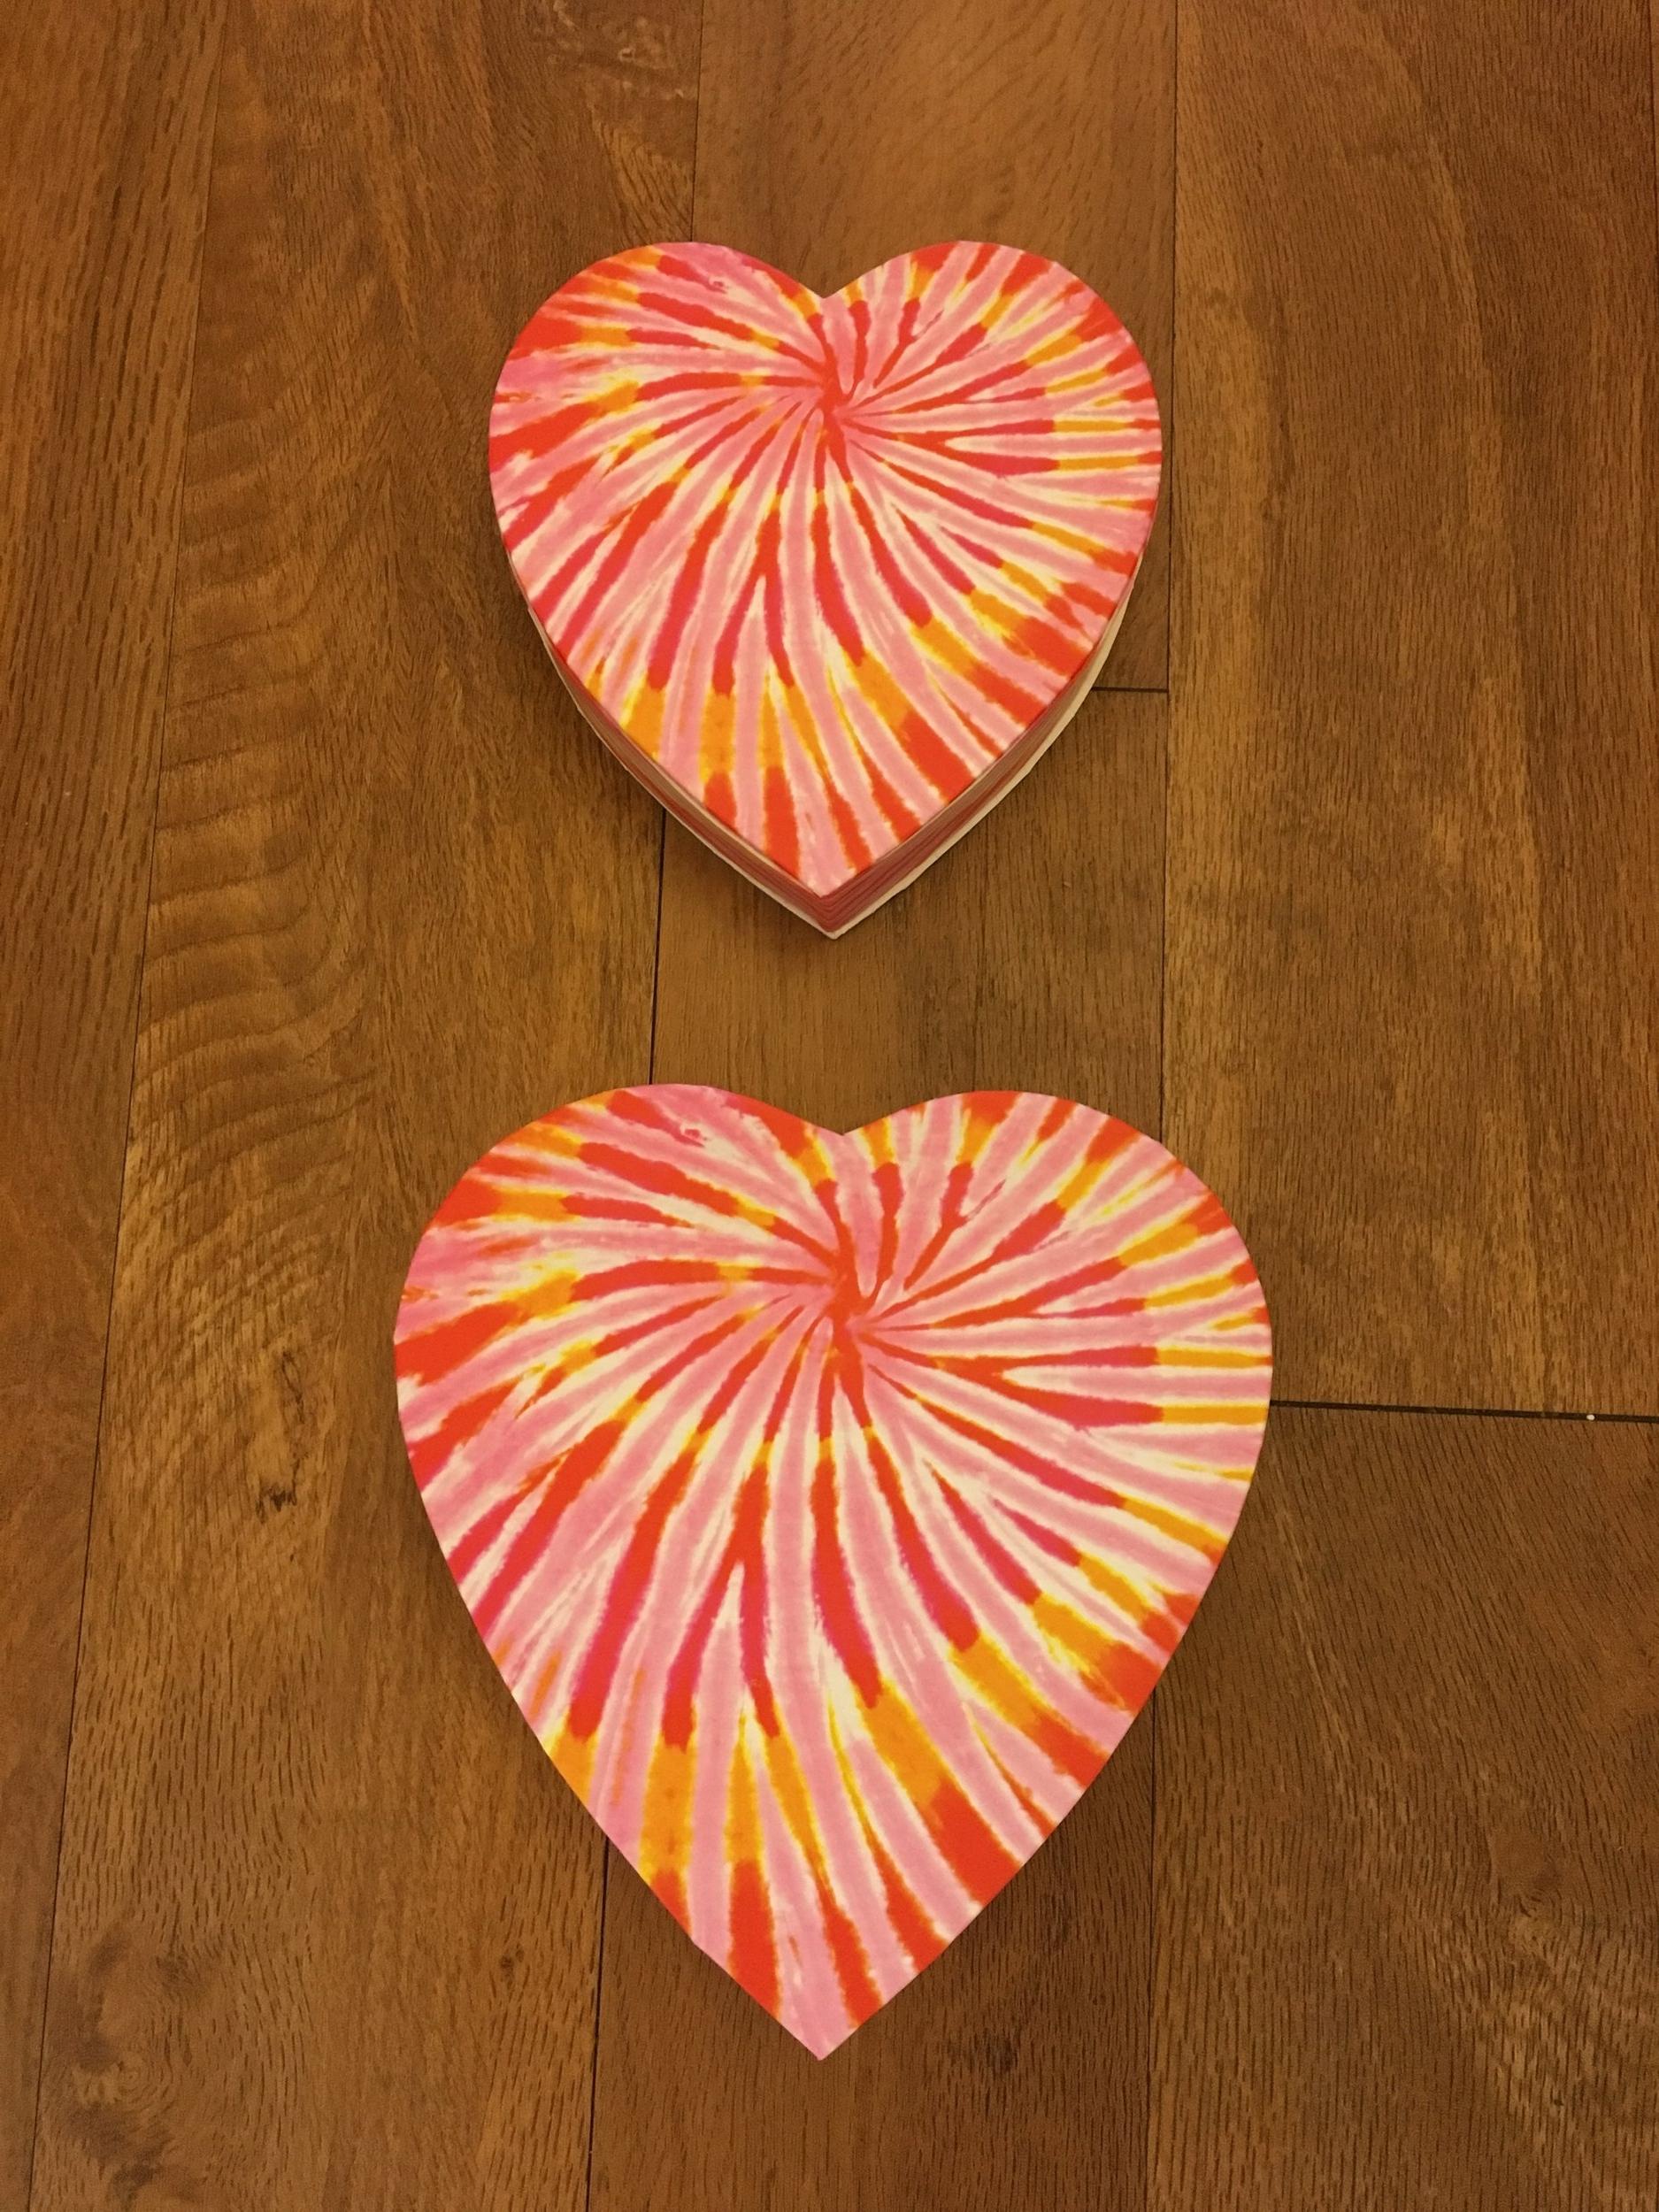 Tye Dye Heart Box   1/2 lb. box - $5.75 4 oz. box - $4.50  (Does not include candy)